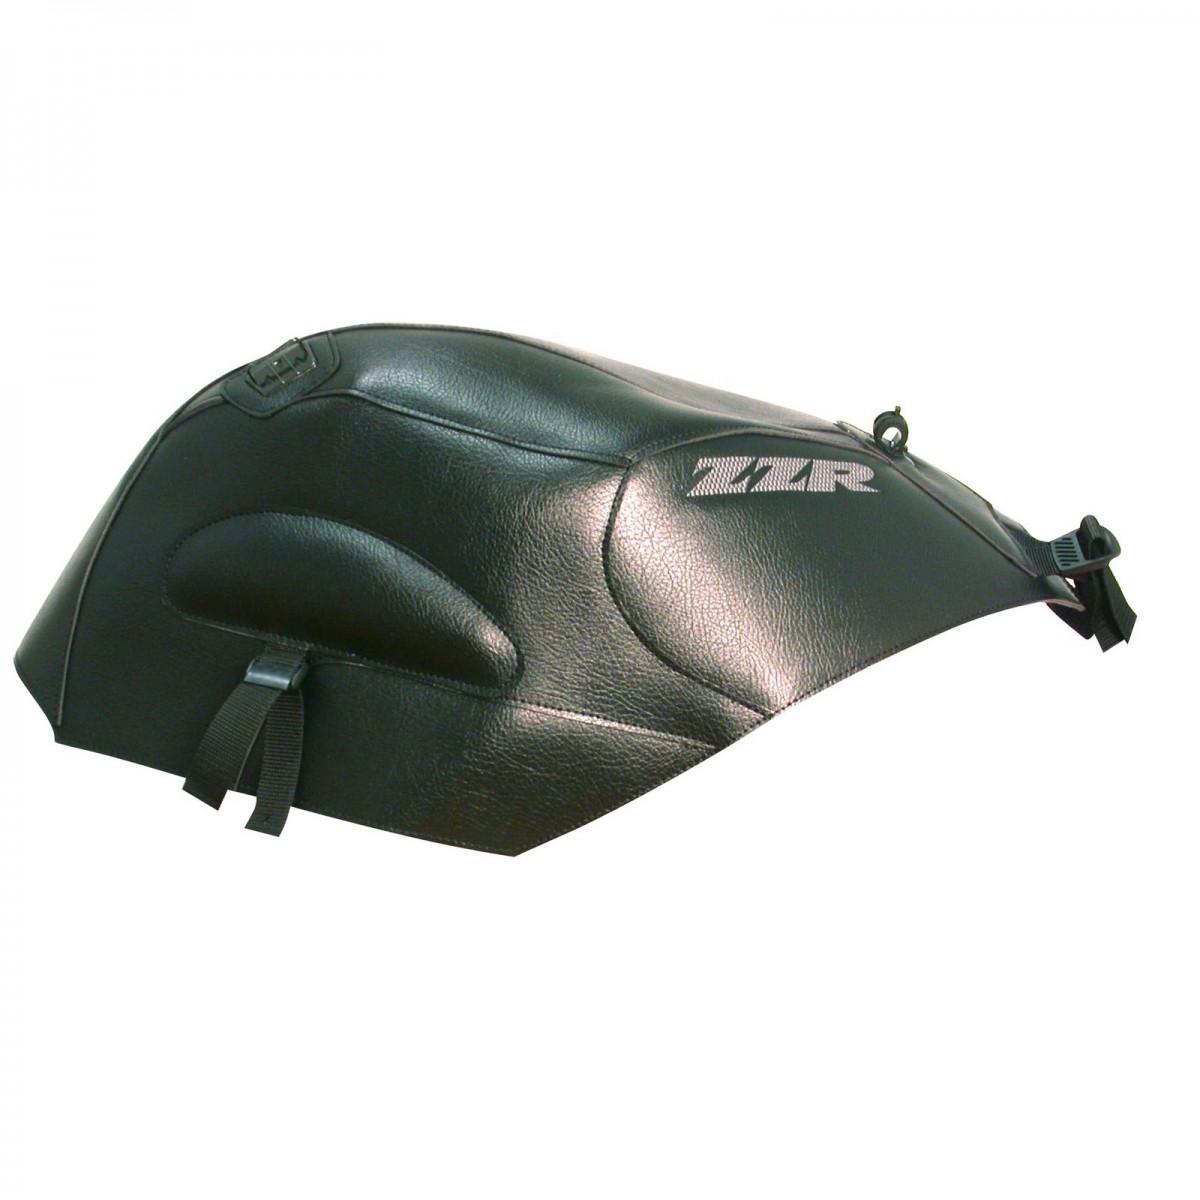 Protège-réservoir Bagster Kawasaki ZZR 1400 06-11 noir